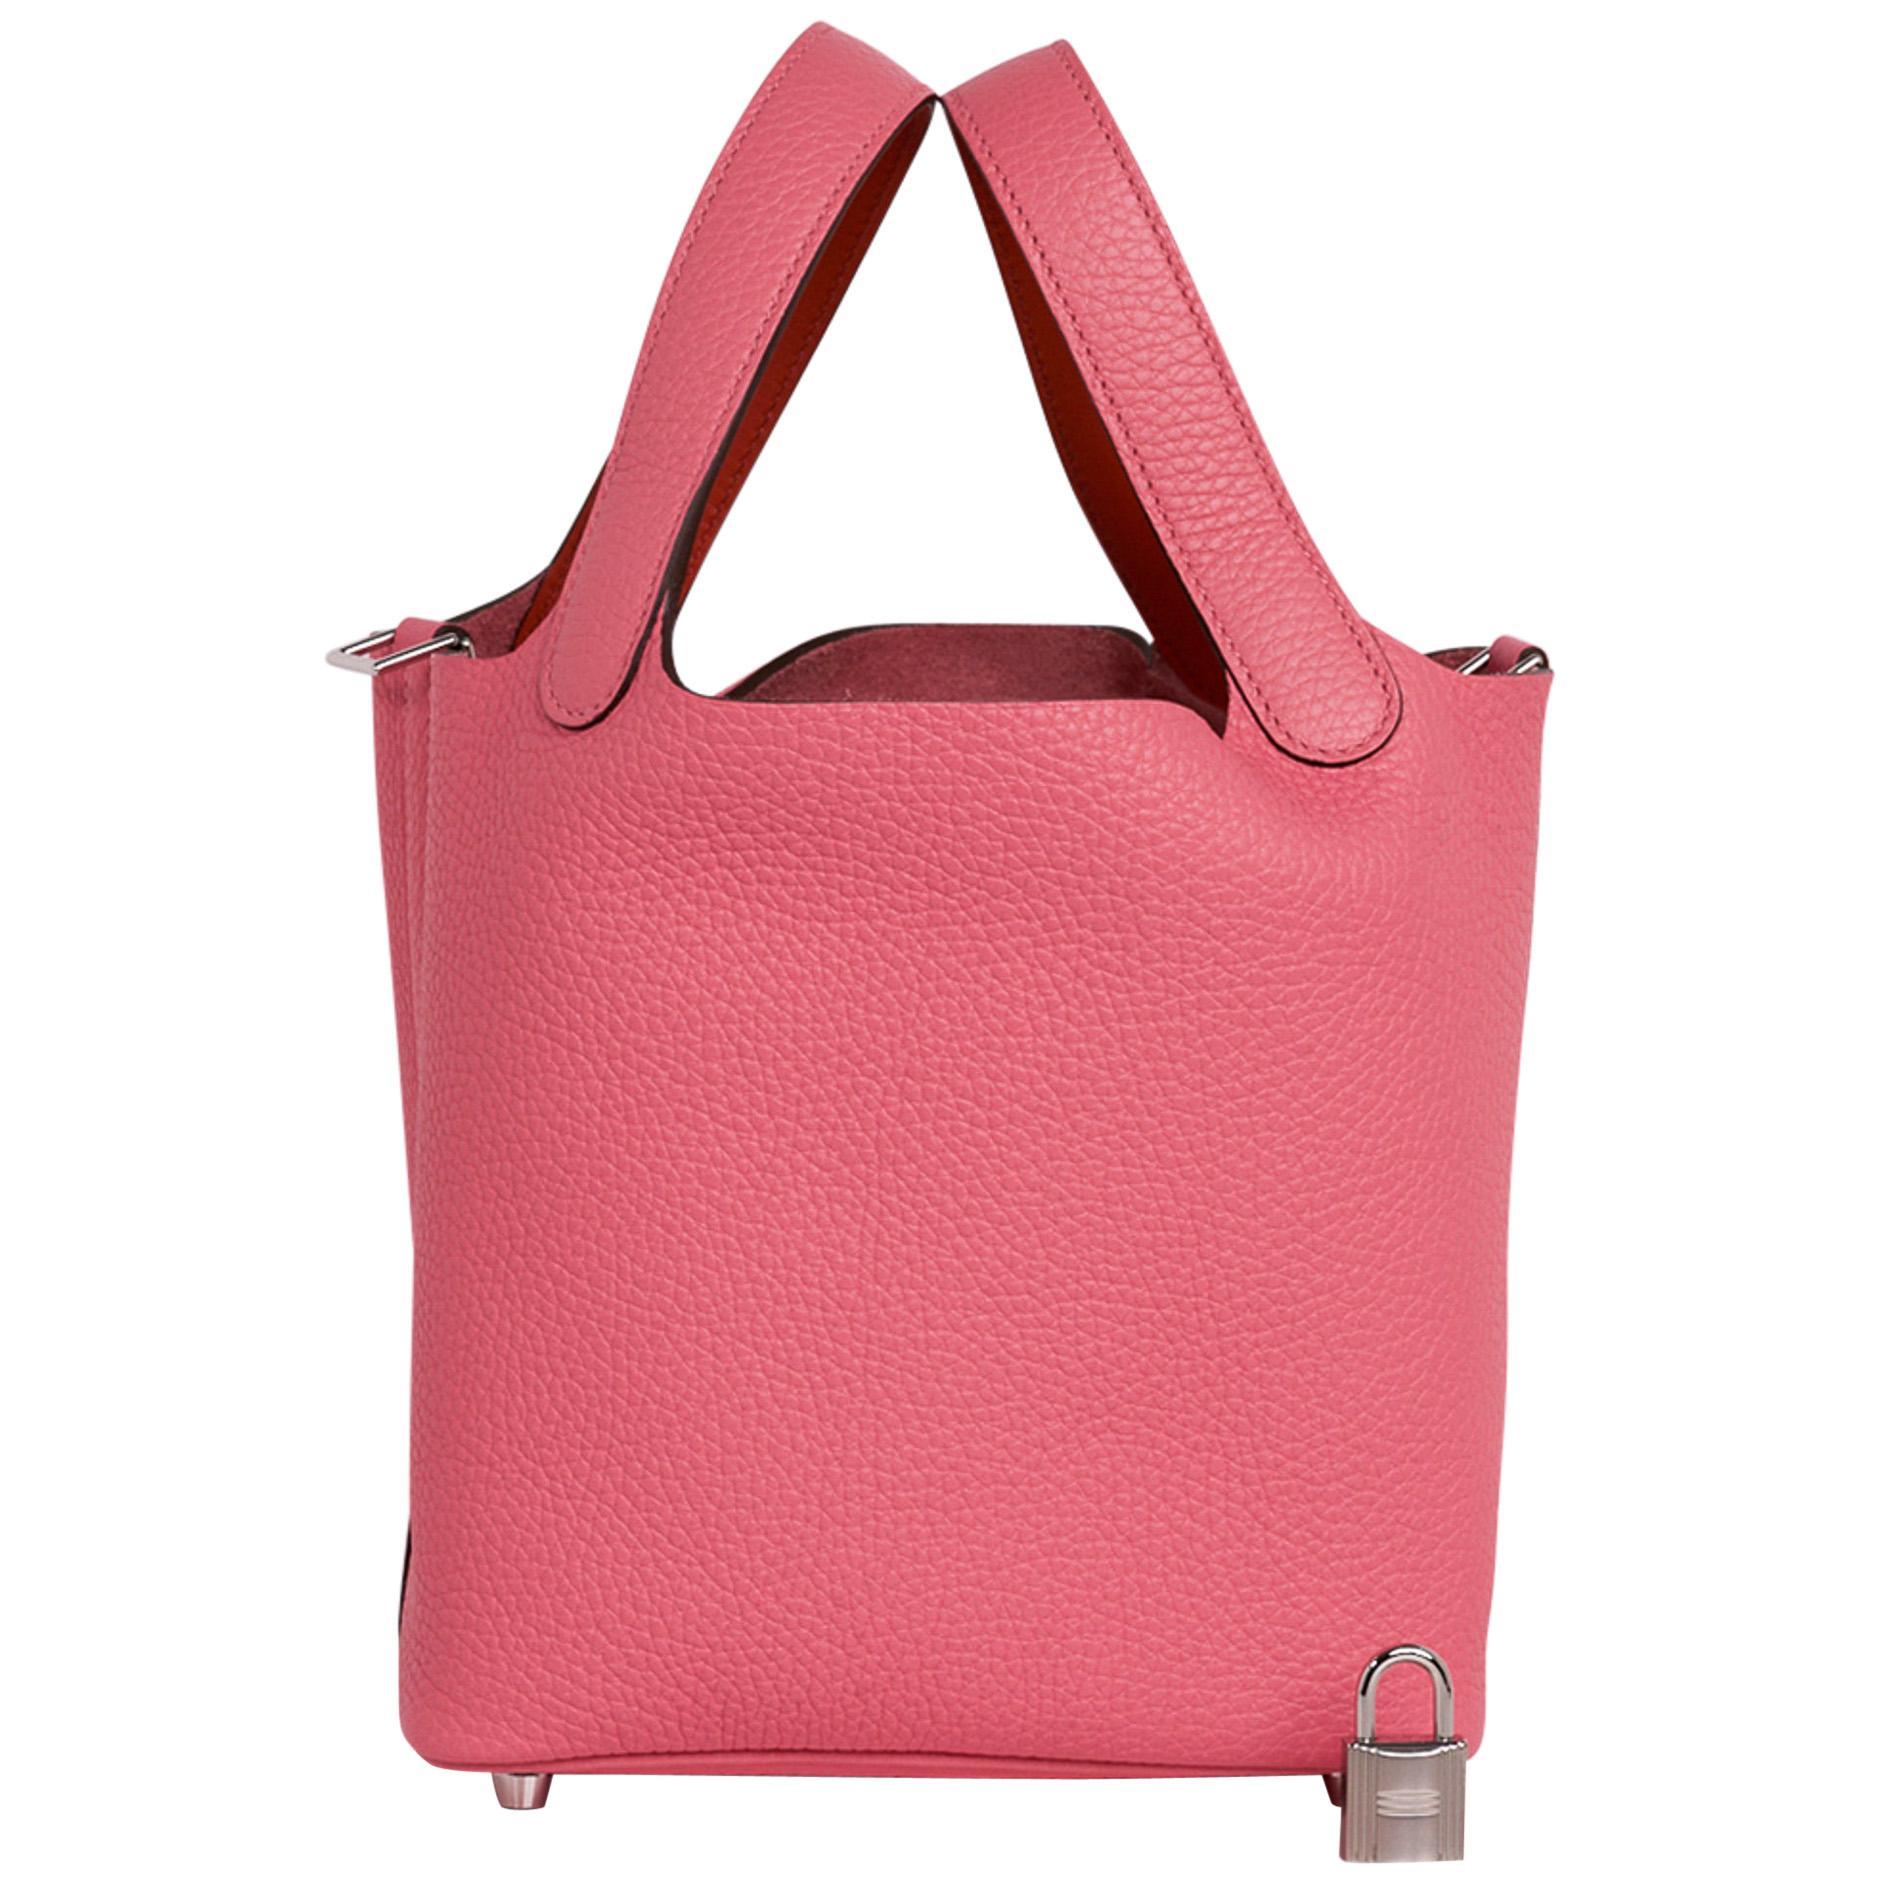 Hermes Picotin Lock 18 Eclat Bag Rose Azalee / Terre Battue Tote Clemence